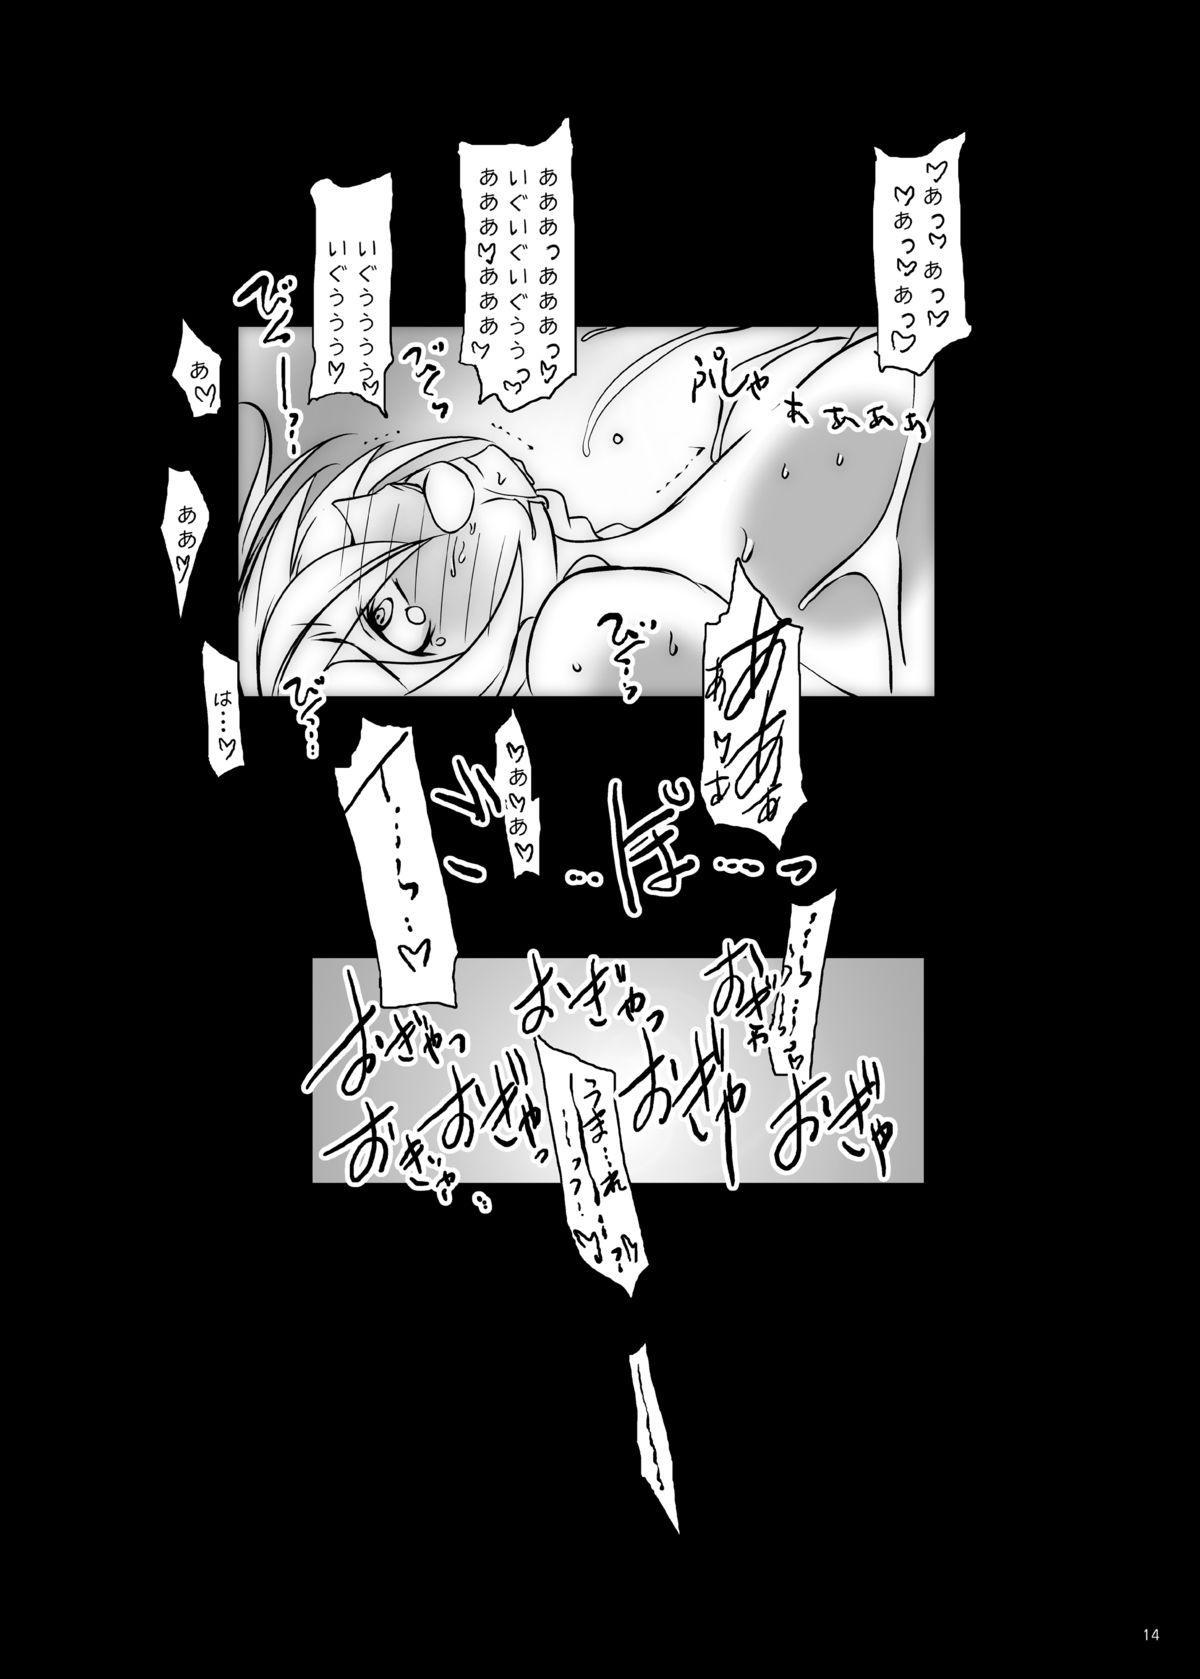 [Suitekiya (Suiteki-ka Yū-min)]Kennai Mating Scandal (1: Einclad / 2: Fairy Dance) SAO The Complete (Sword Art Online) 28